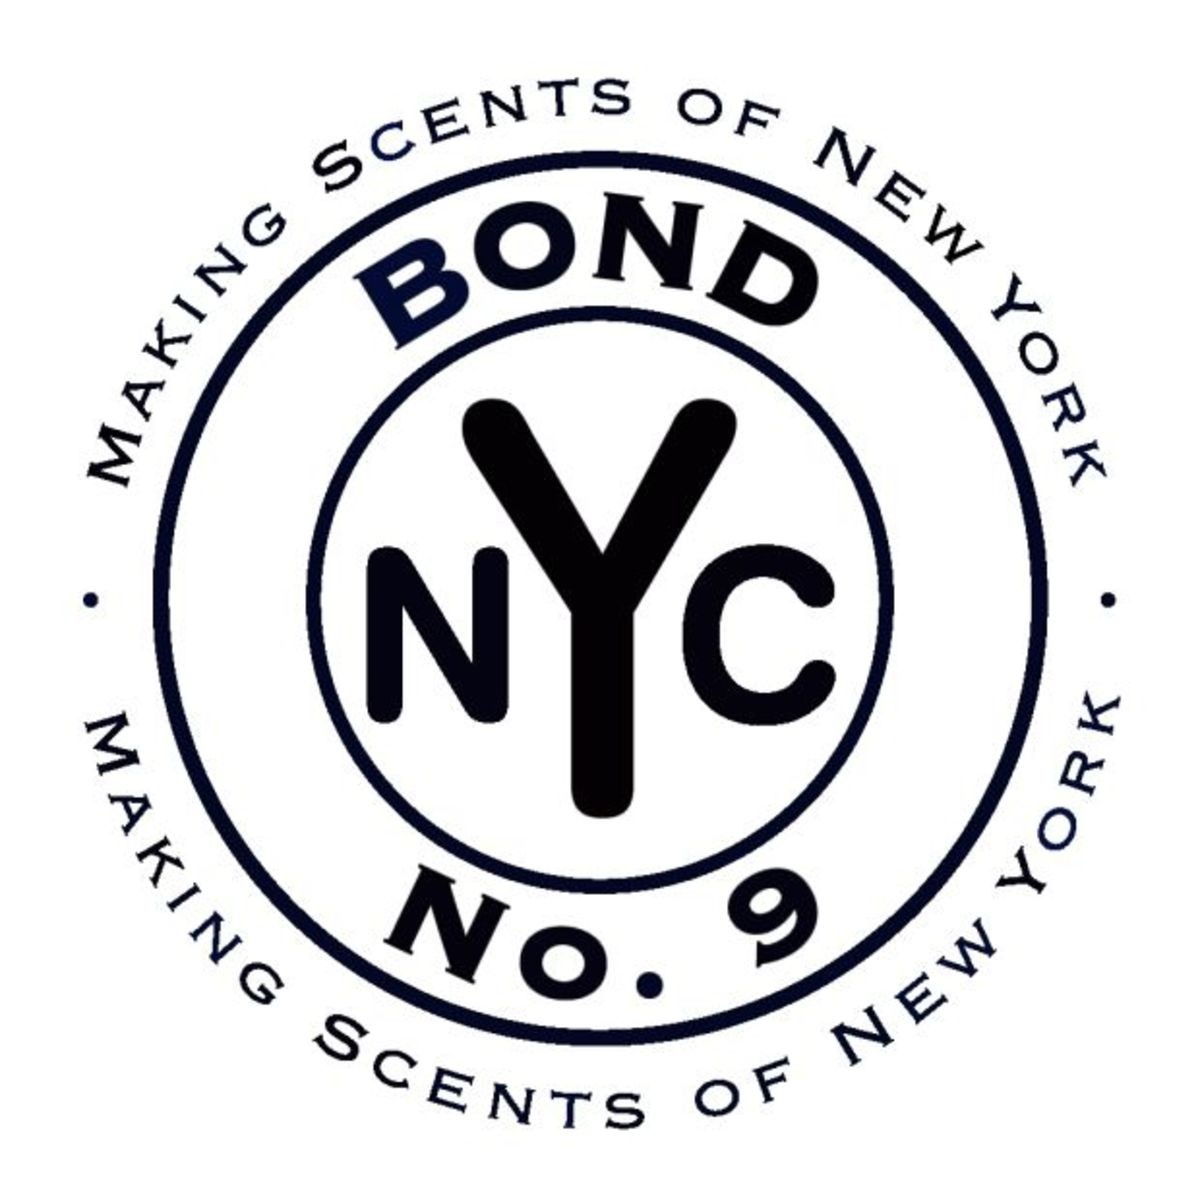 Nyc Bond No:9